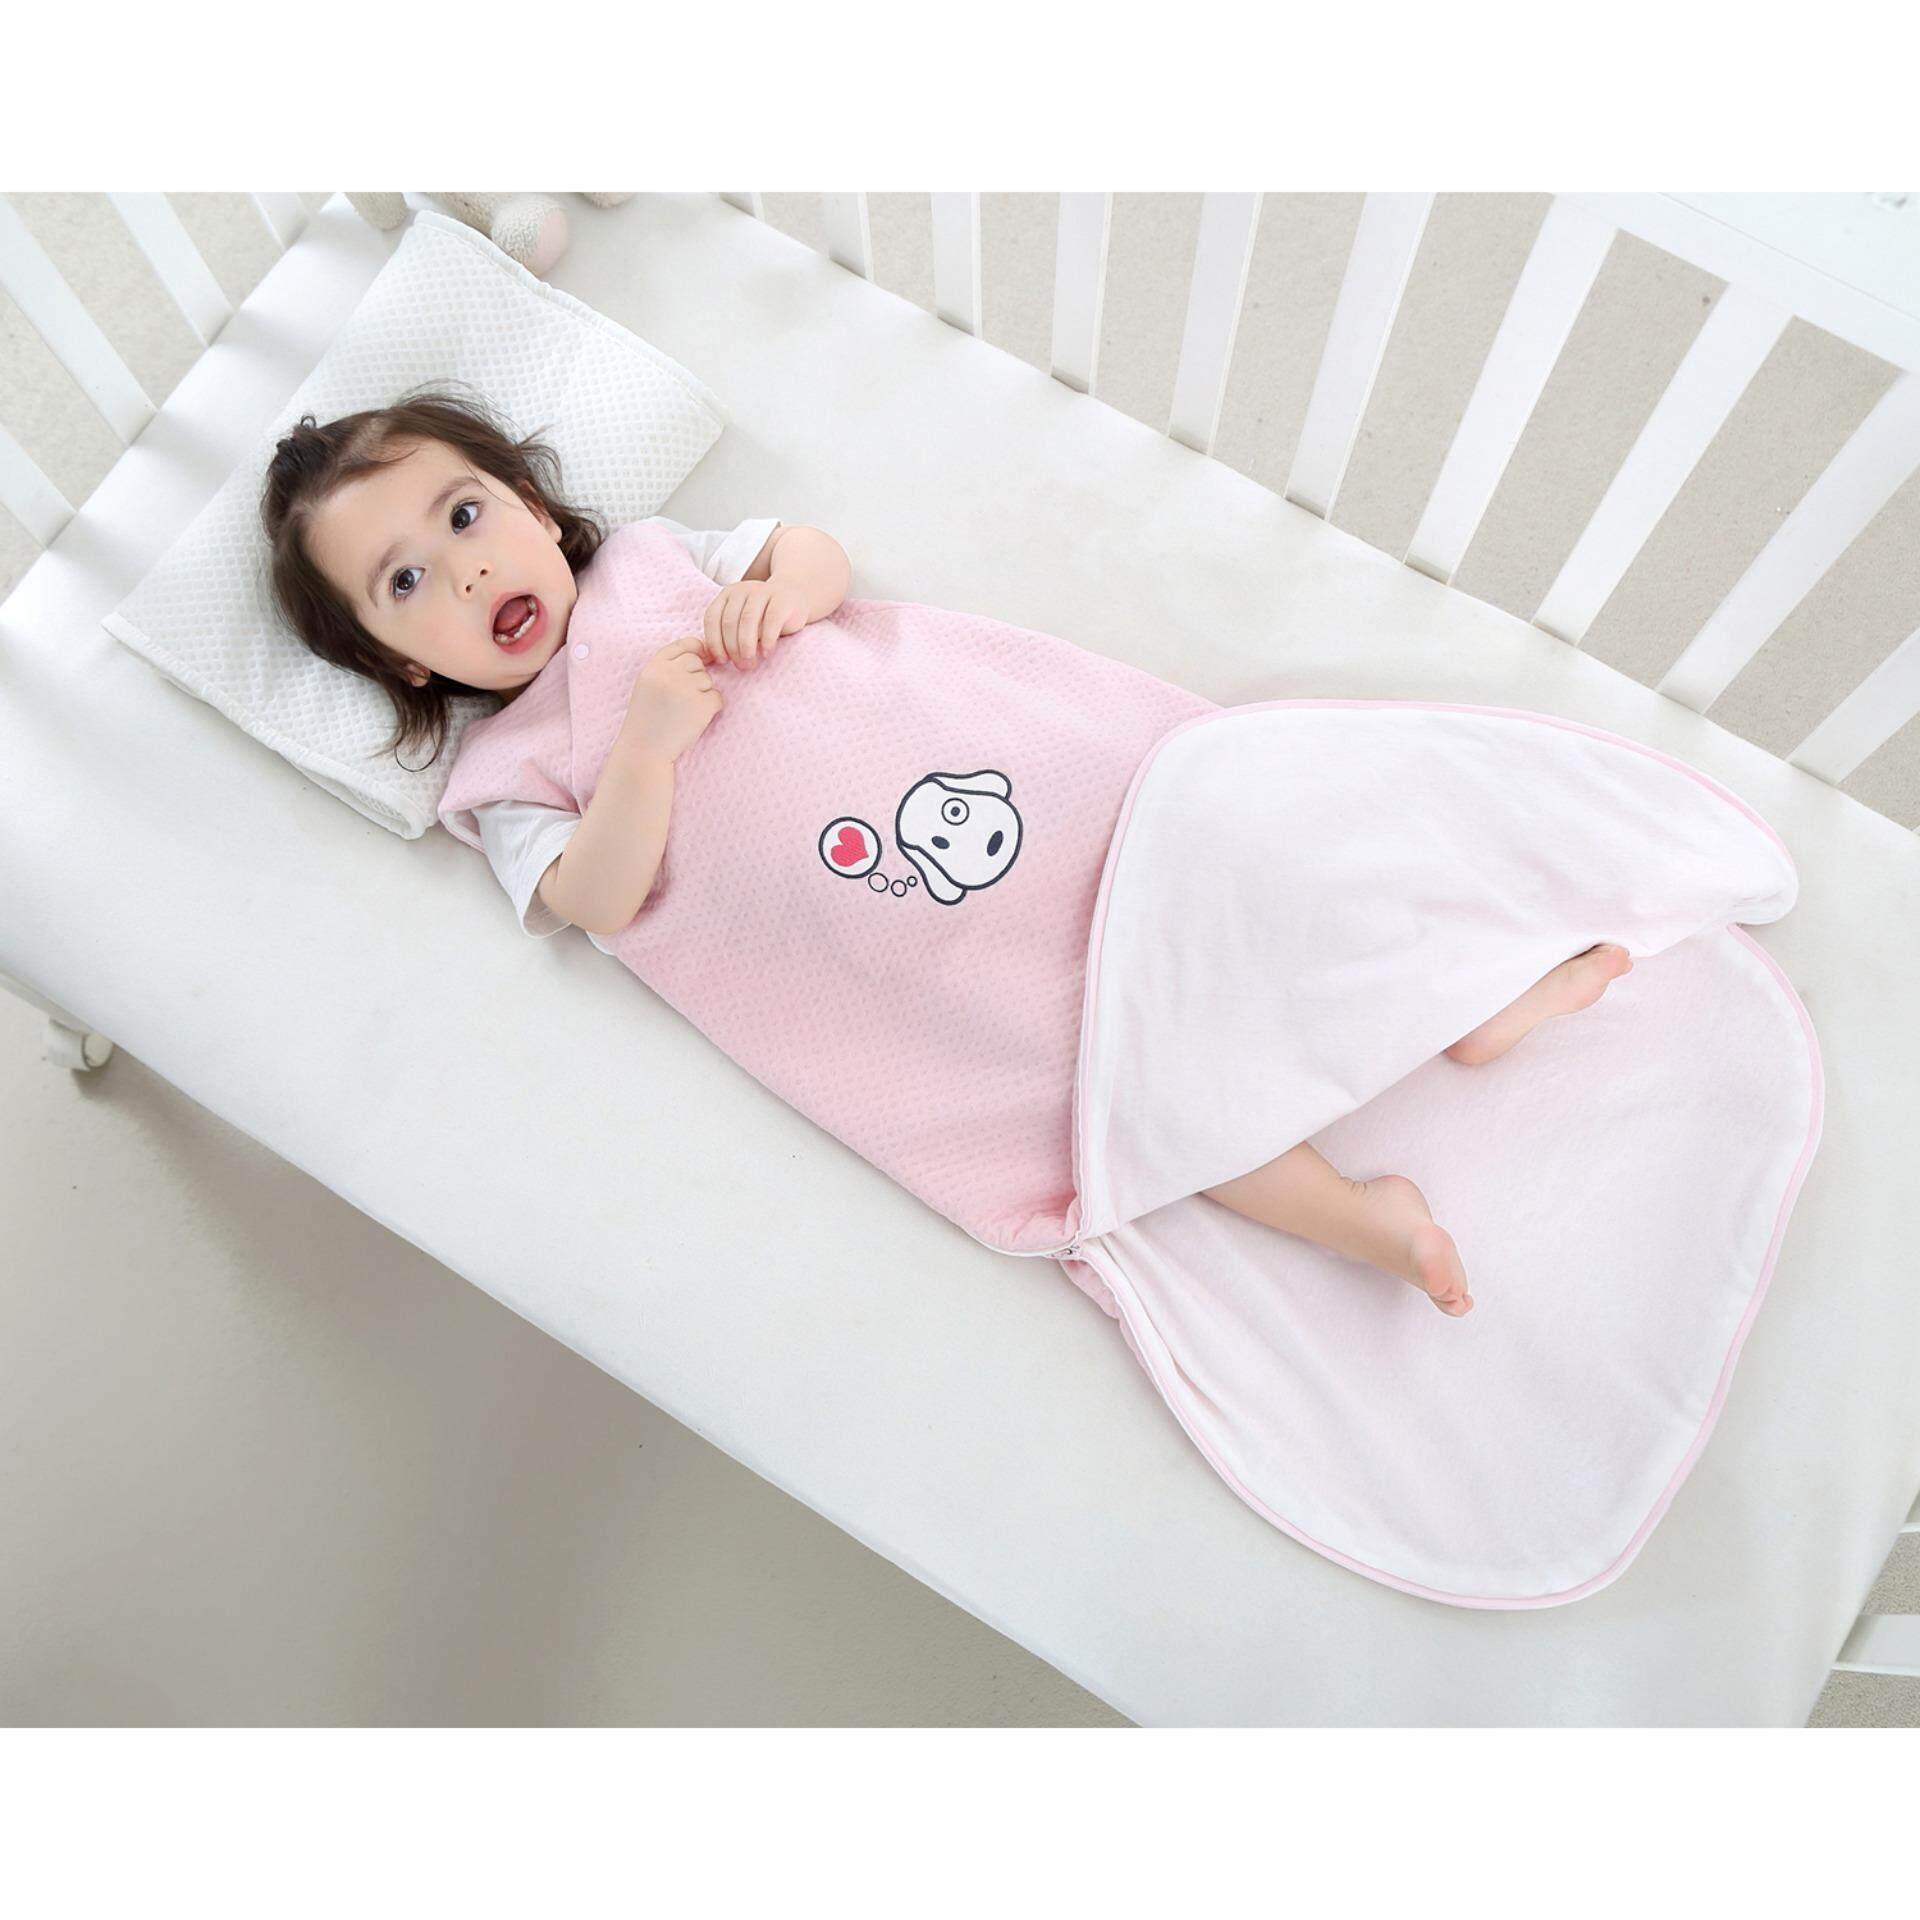 NiceEshop Baby Sleeping Bag Wearable Blanket 100% Cotton Sleepsack Di Musim Panas, Hitam dan Putih-Internasional